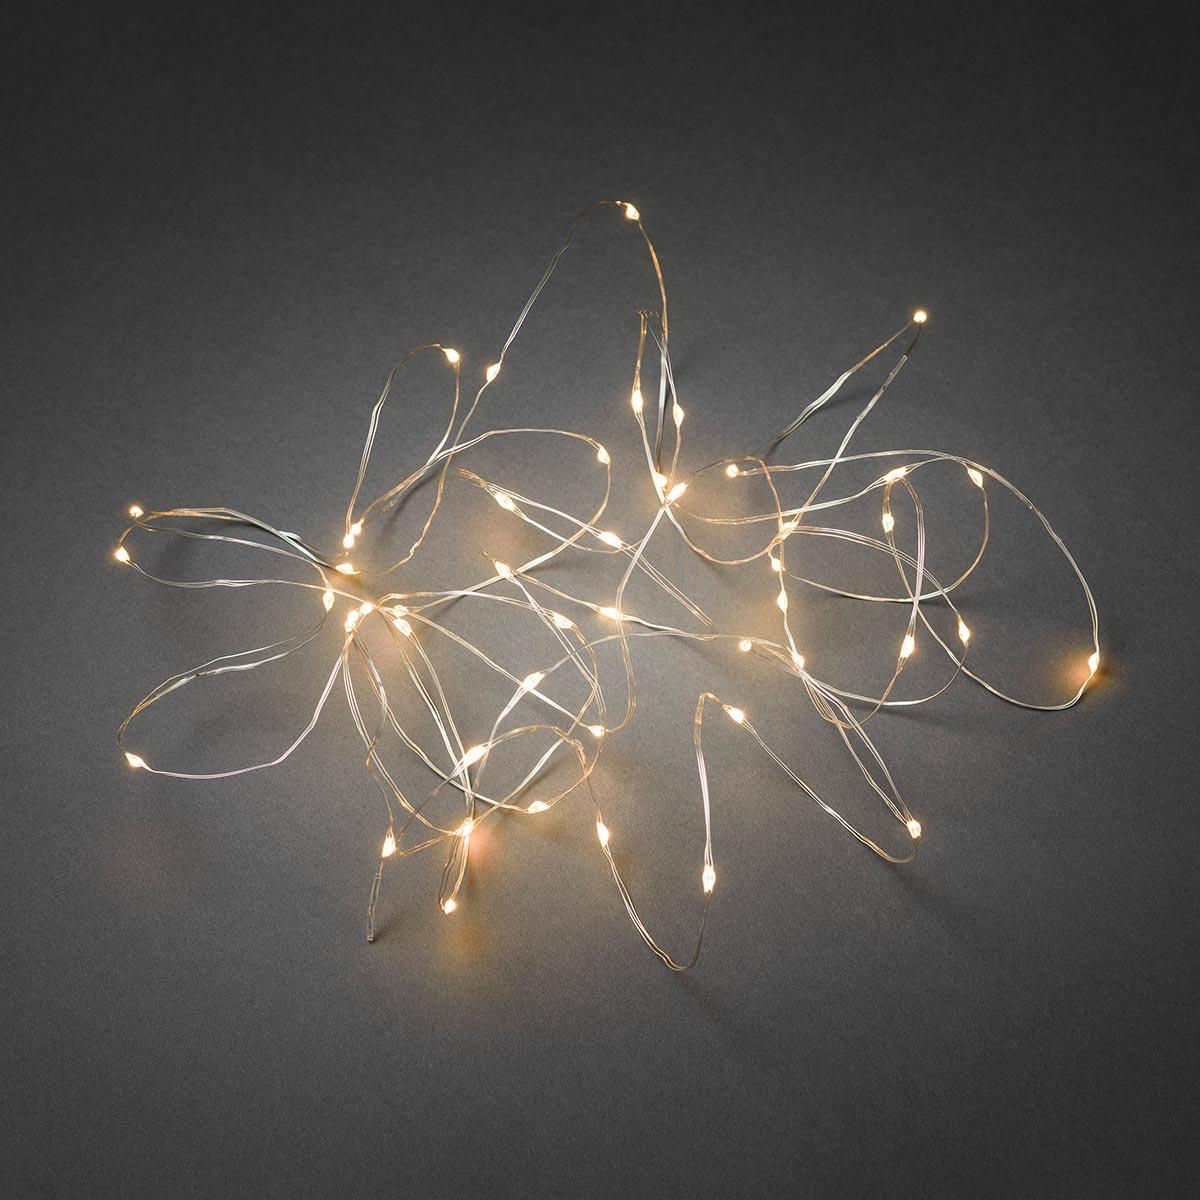 LED Tropfenlichterkette 4.9m 50 bernsteinfarbene Dioden 12V IP20 ...